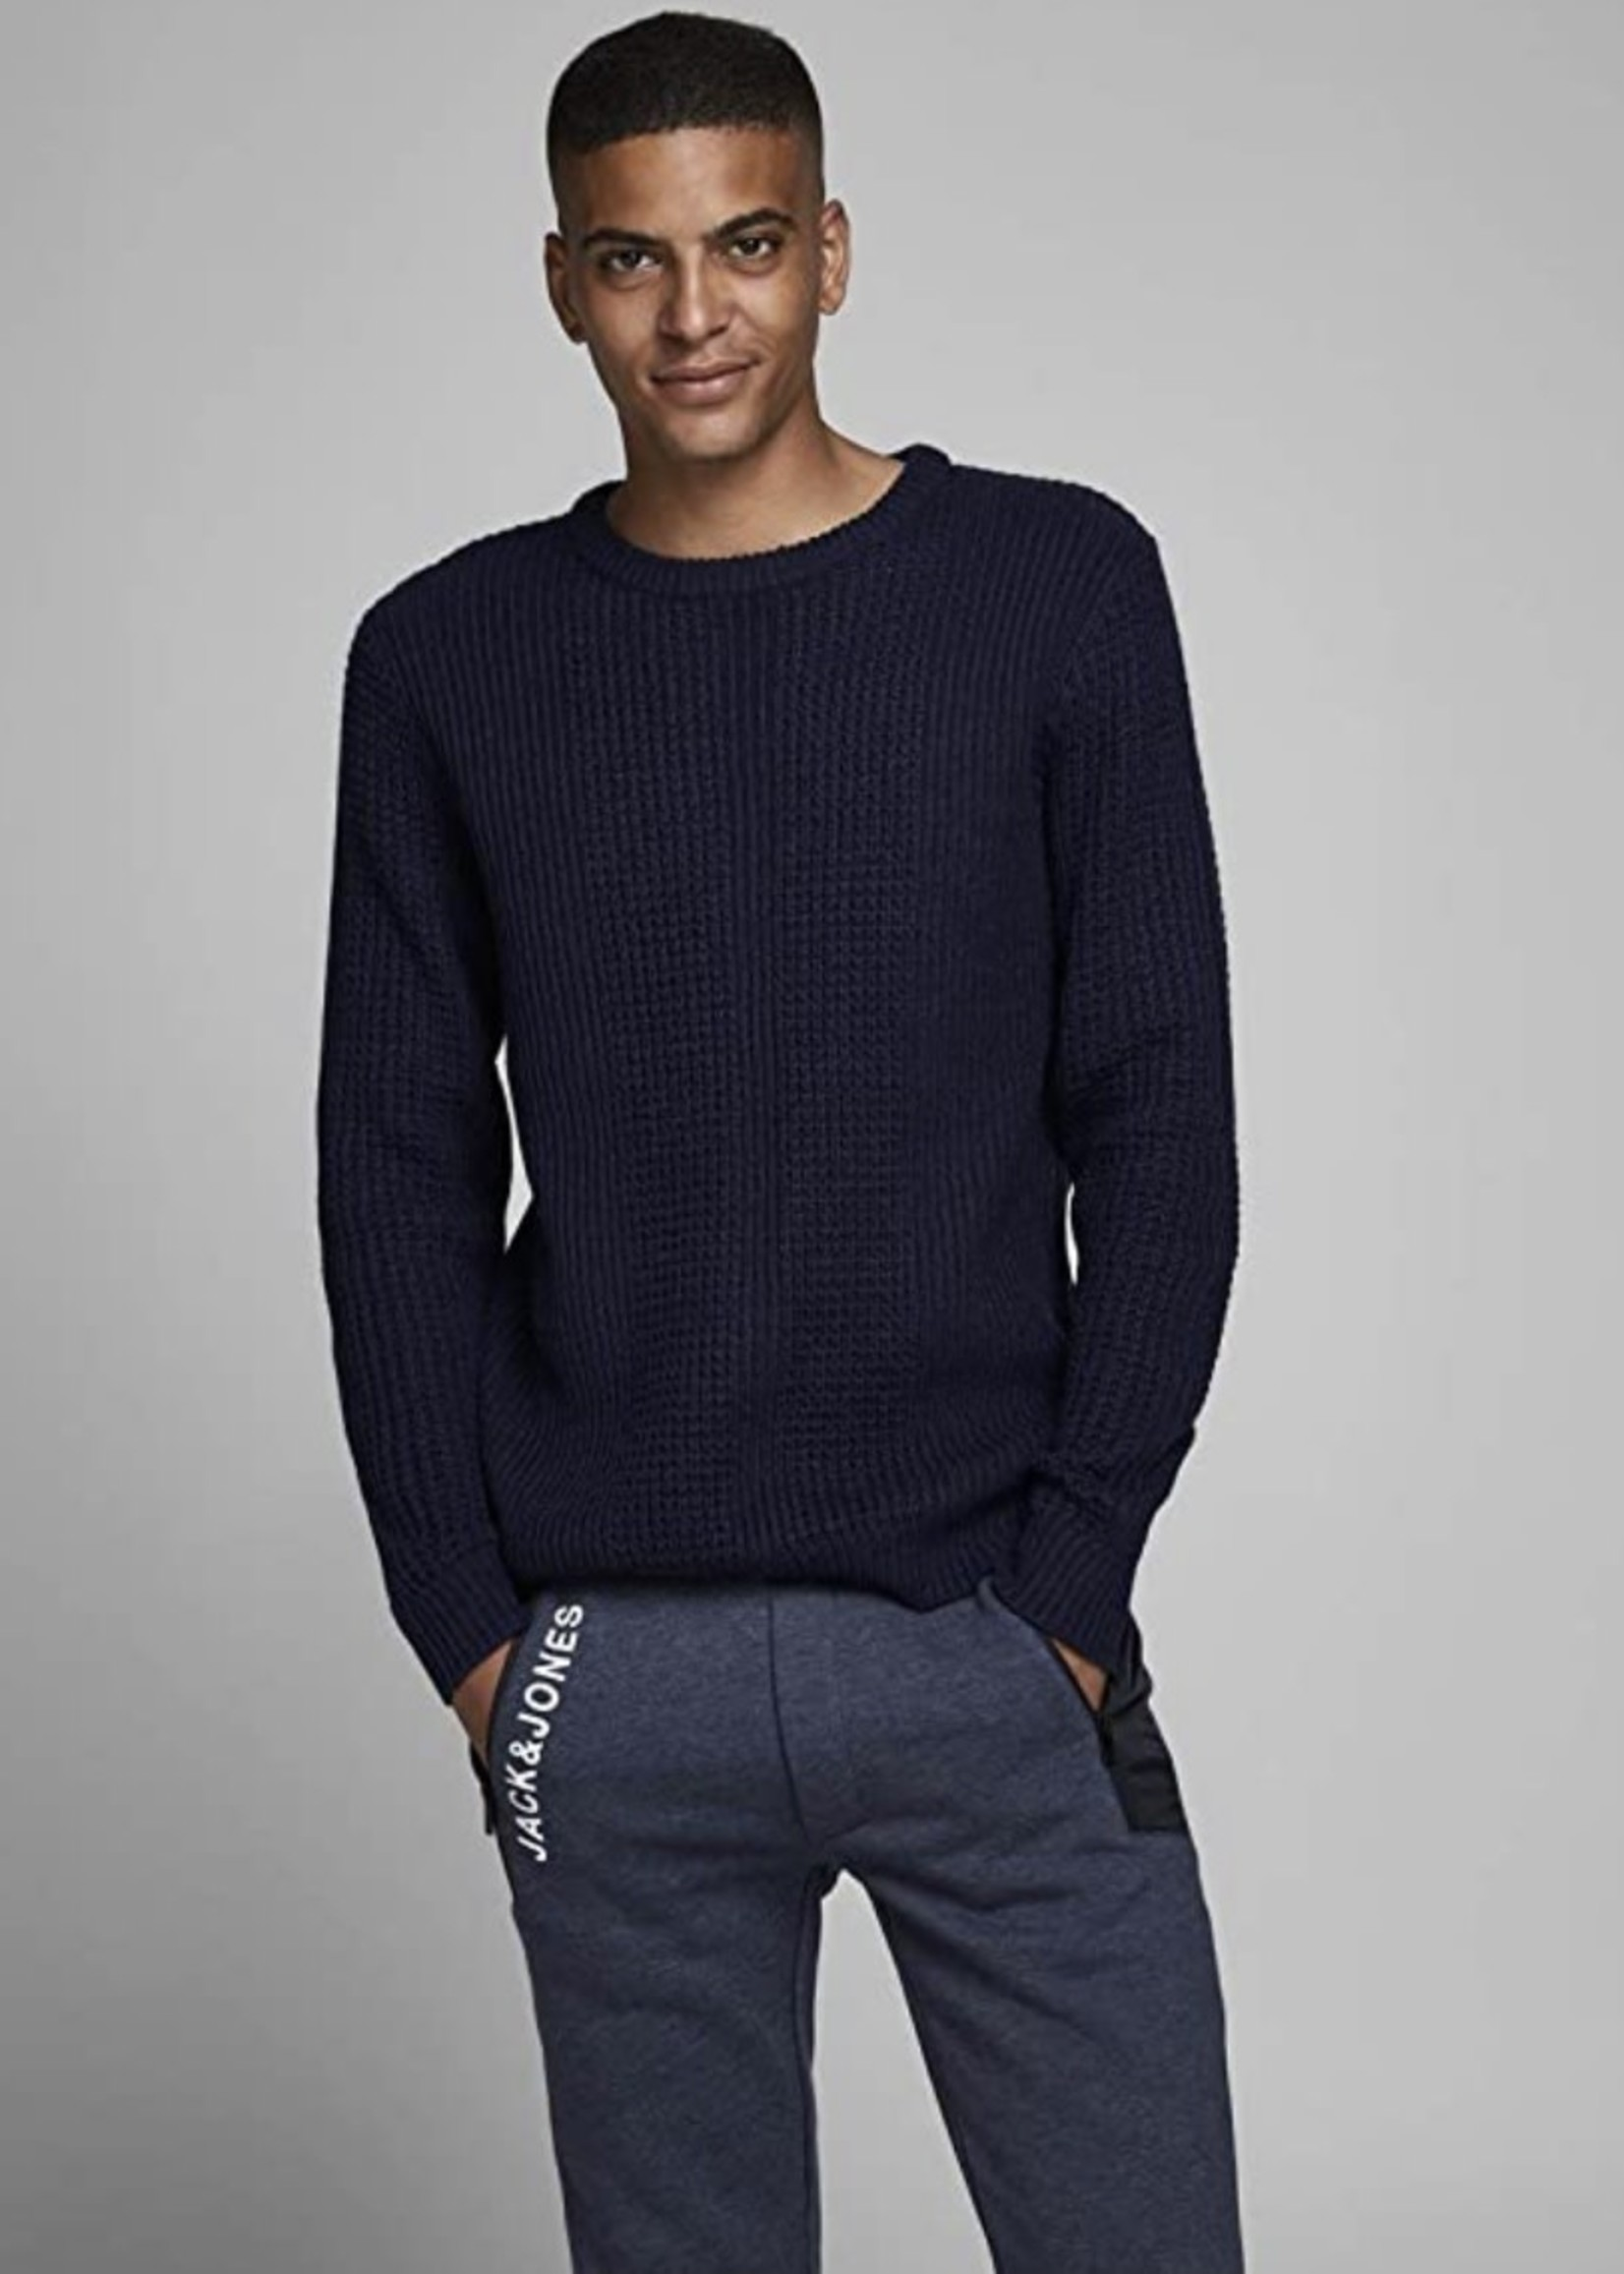 JACK & JONES Knit Crew Neck Sweater